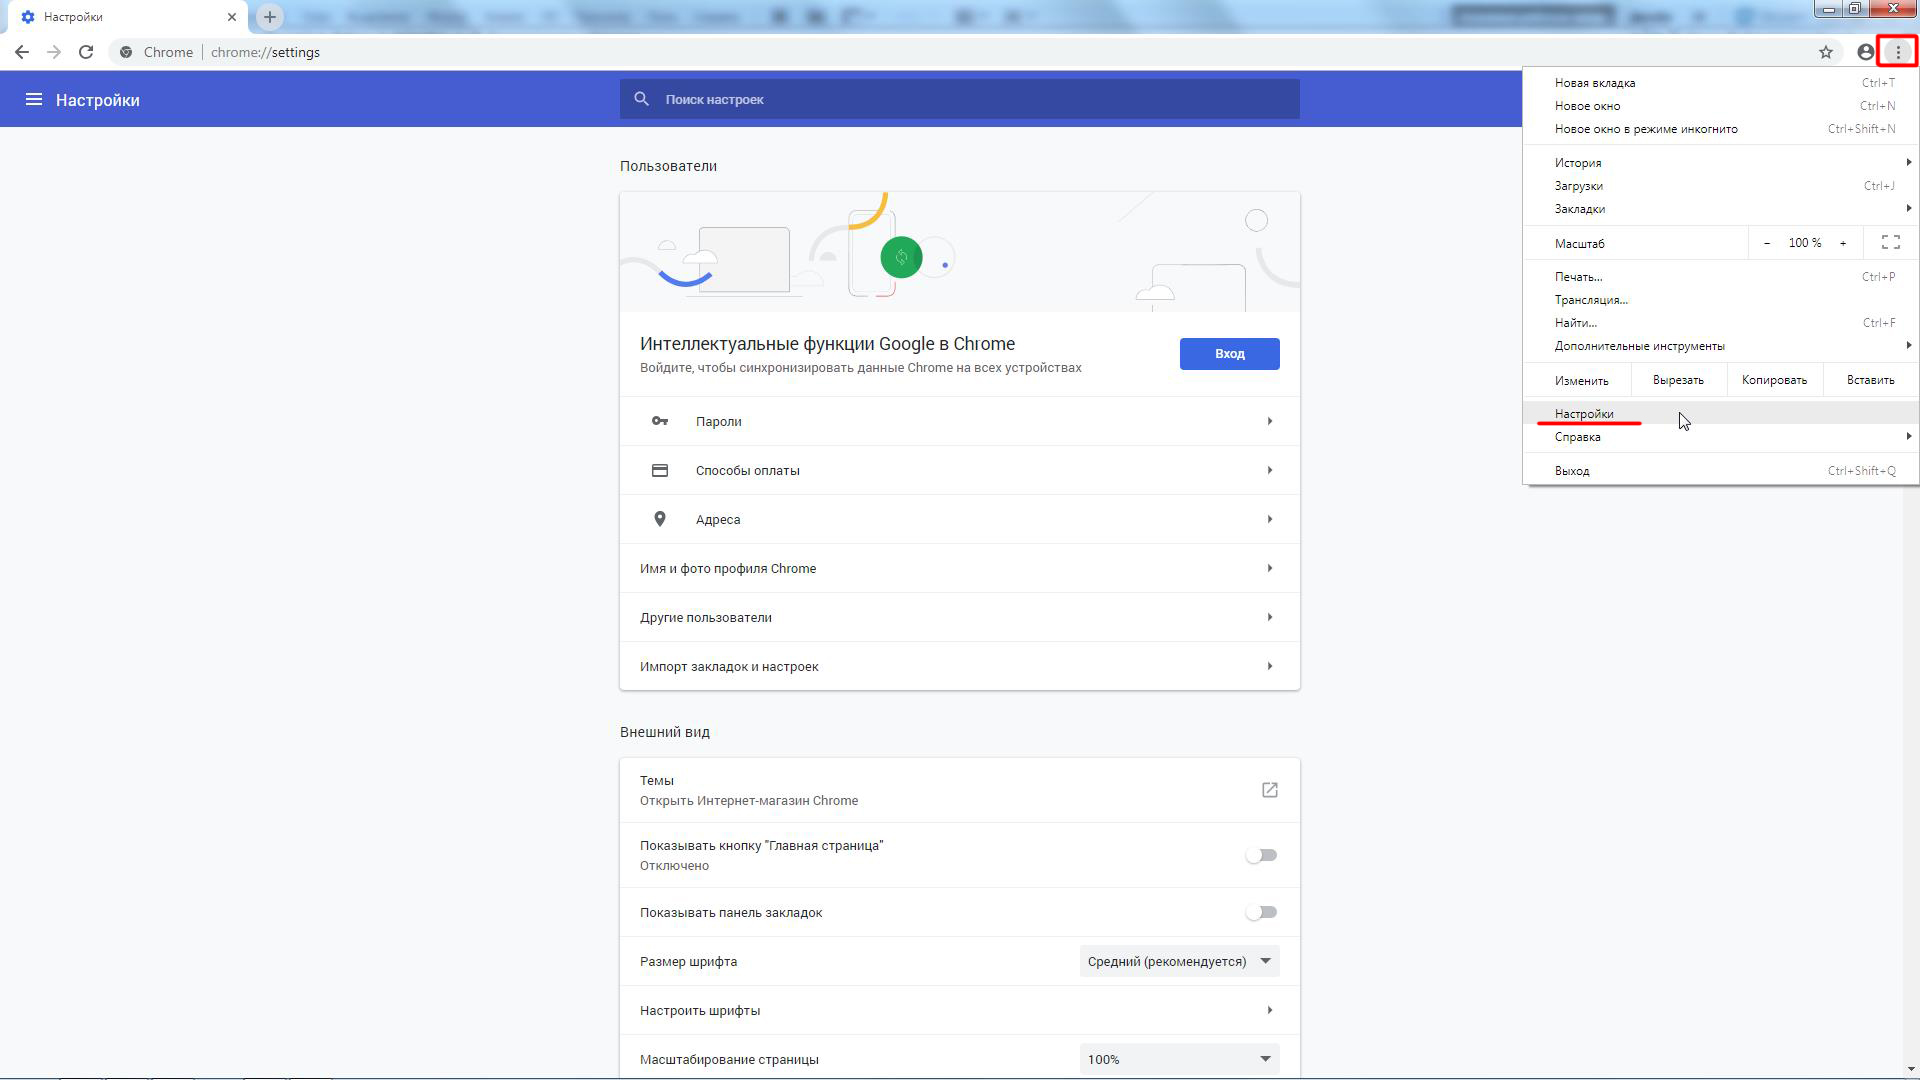 Панель настроек браузера Google Chrome